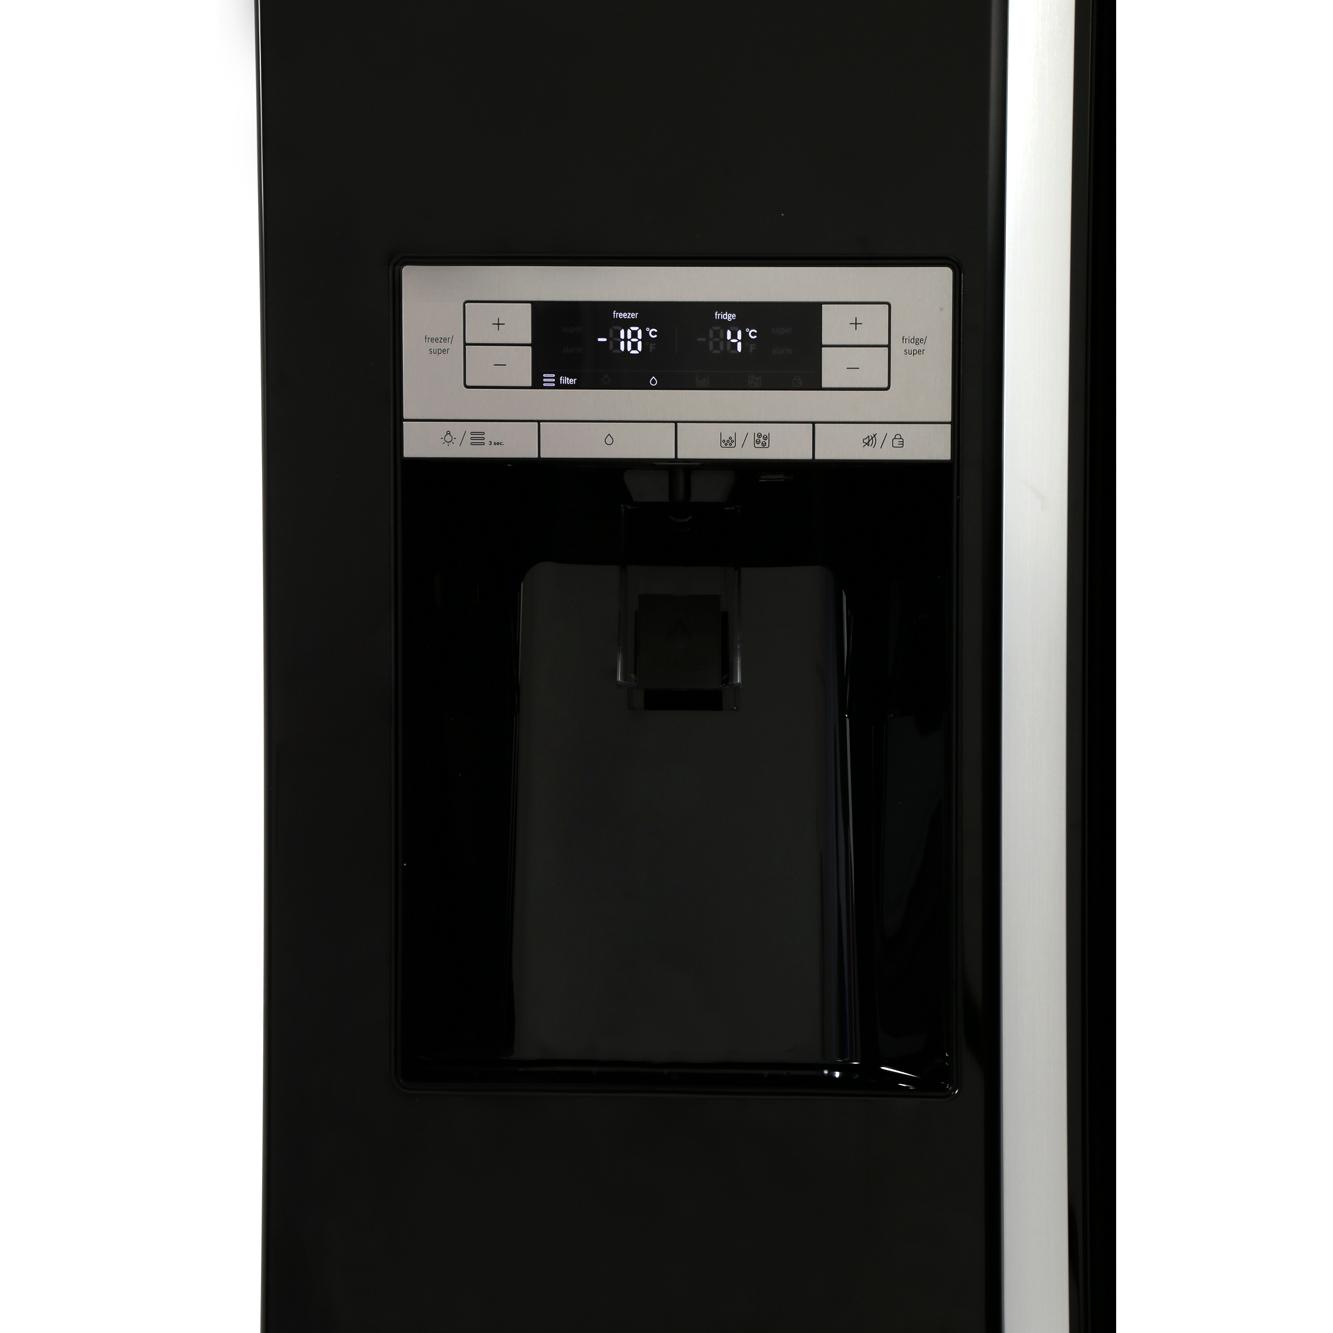 Bosch Kad90vb20g American Style Fridge Freezer Black